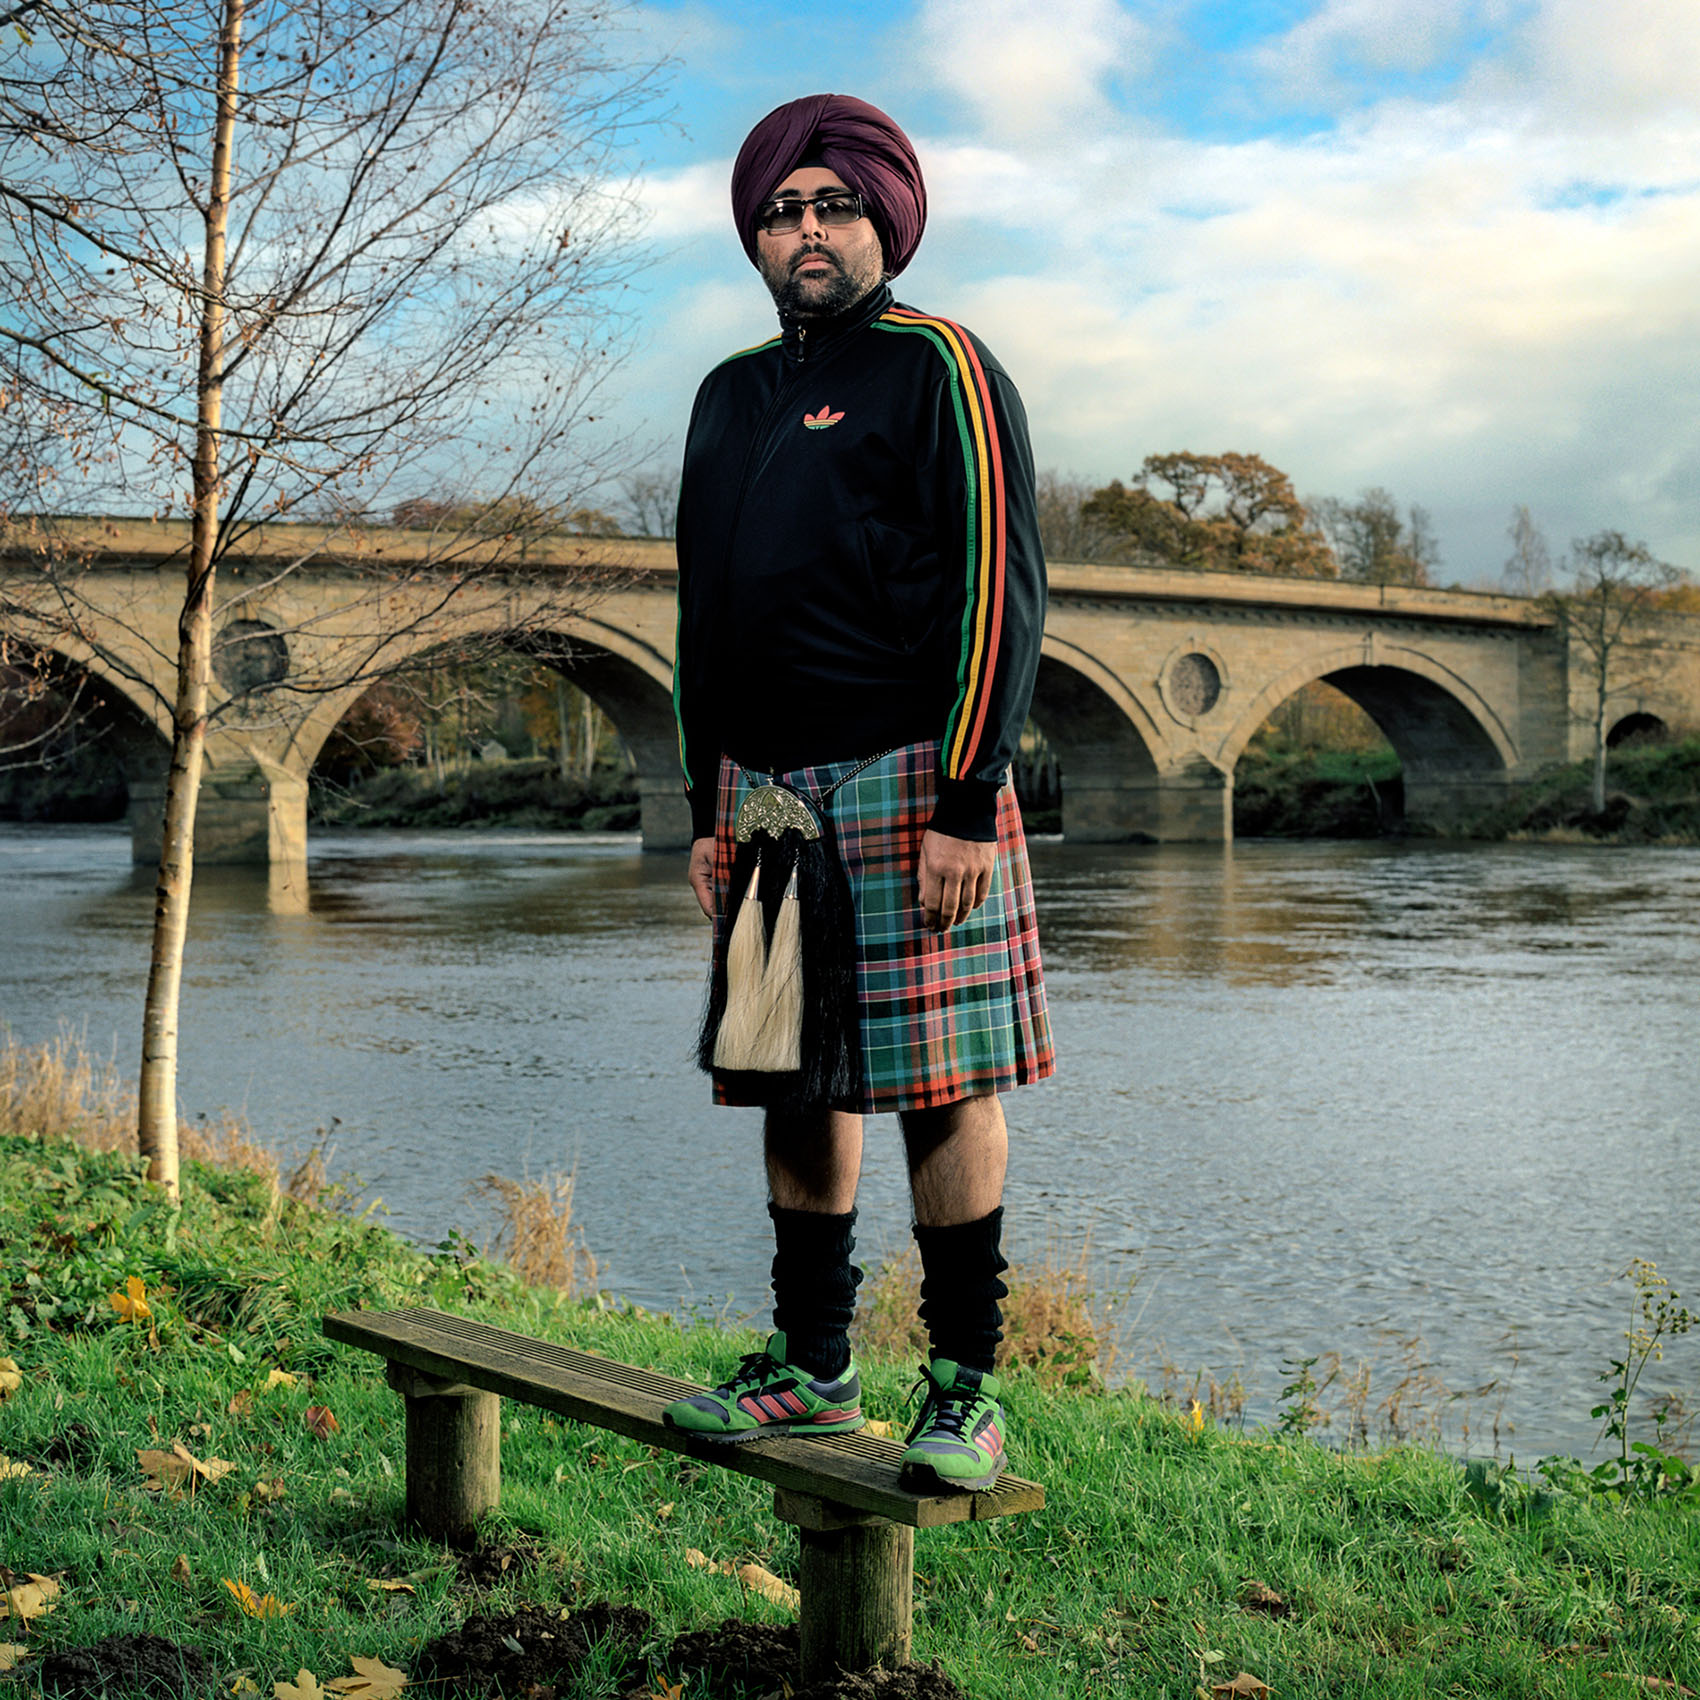 Hardeep Singh Kohli - comedian and broadcaster